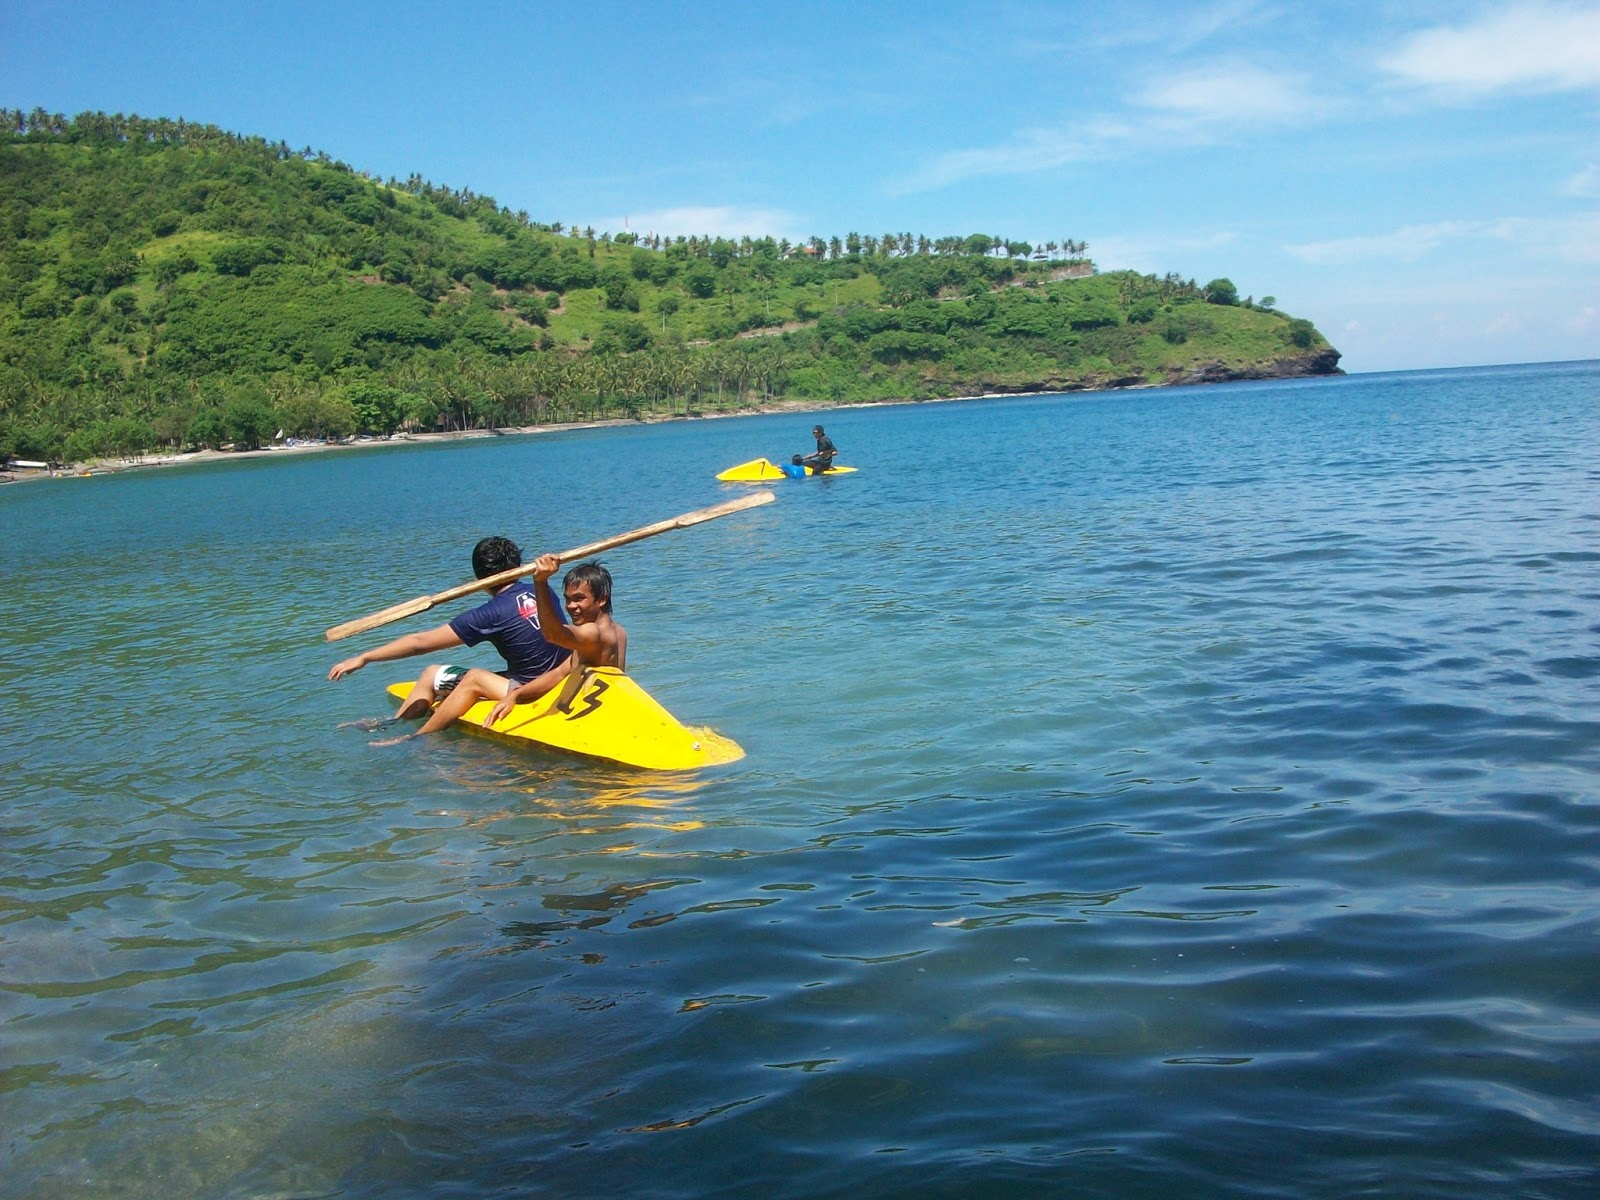 Pantai Malimbu Lombok Utara Blog Pariwisata Bukan Kita Bisa Melihat